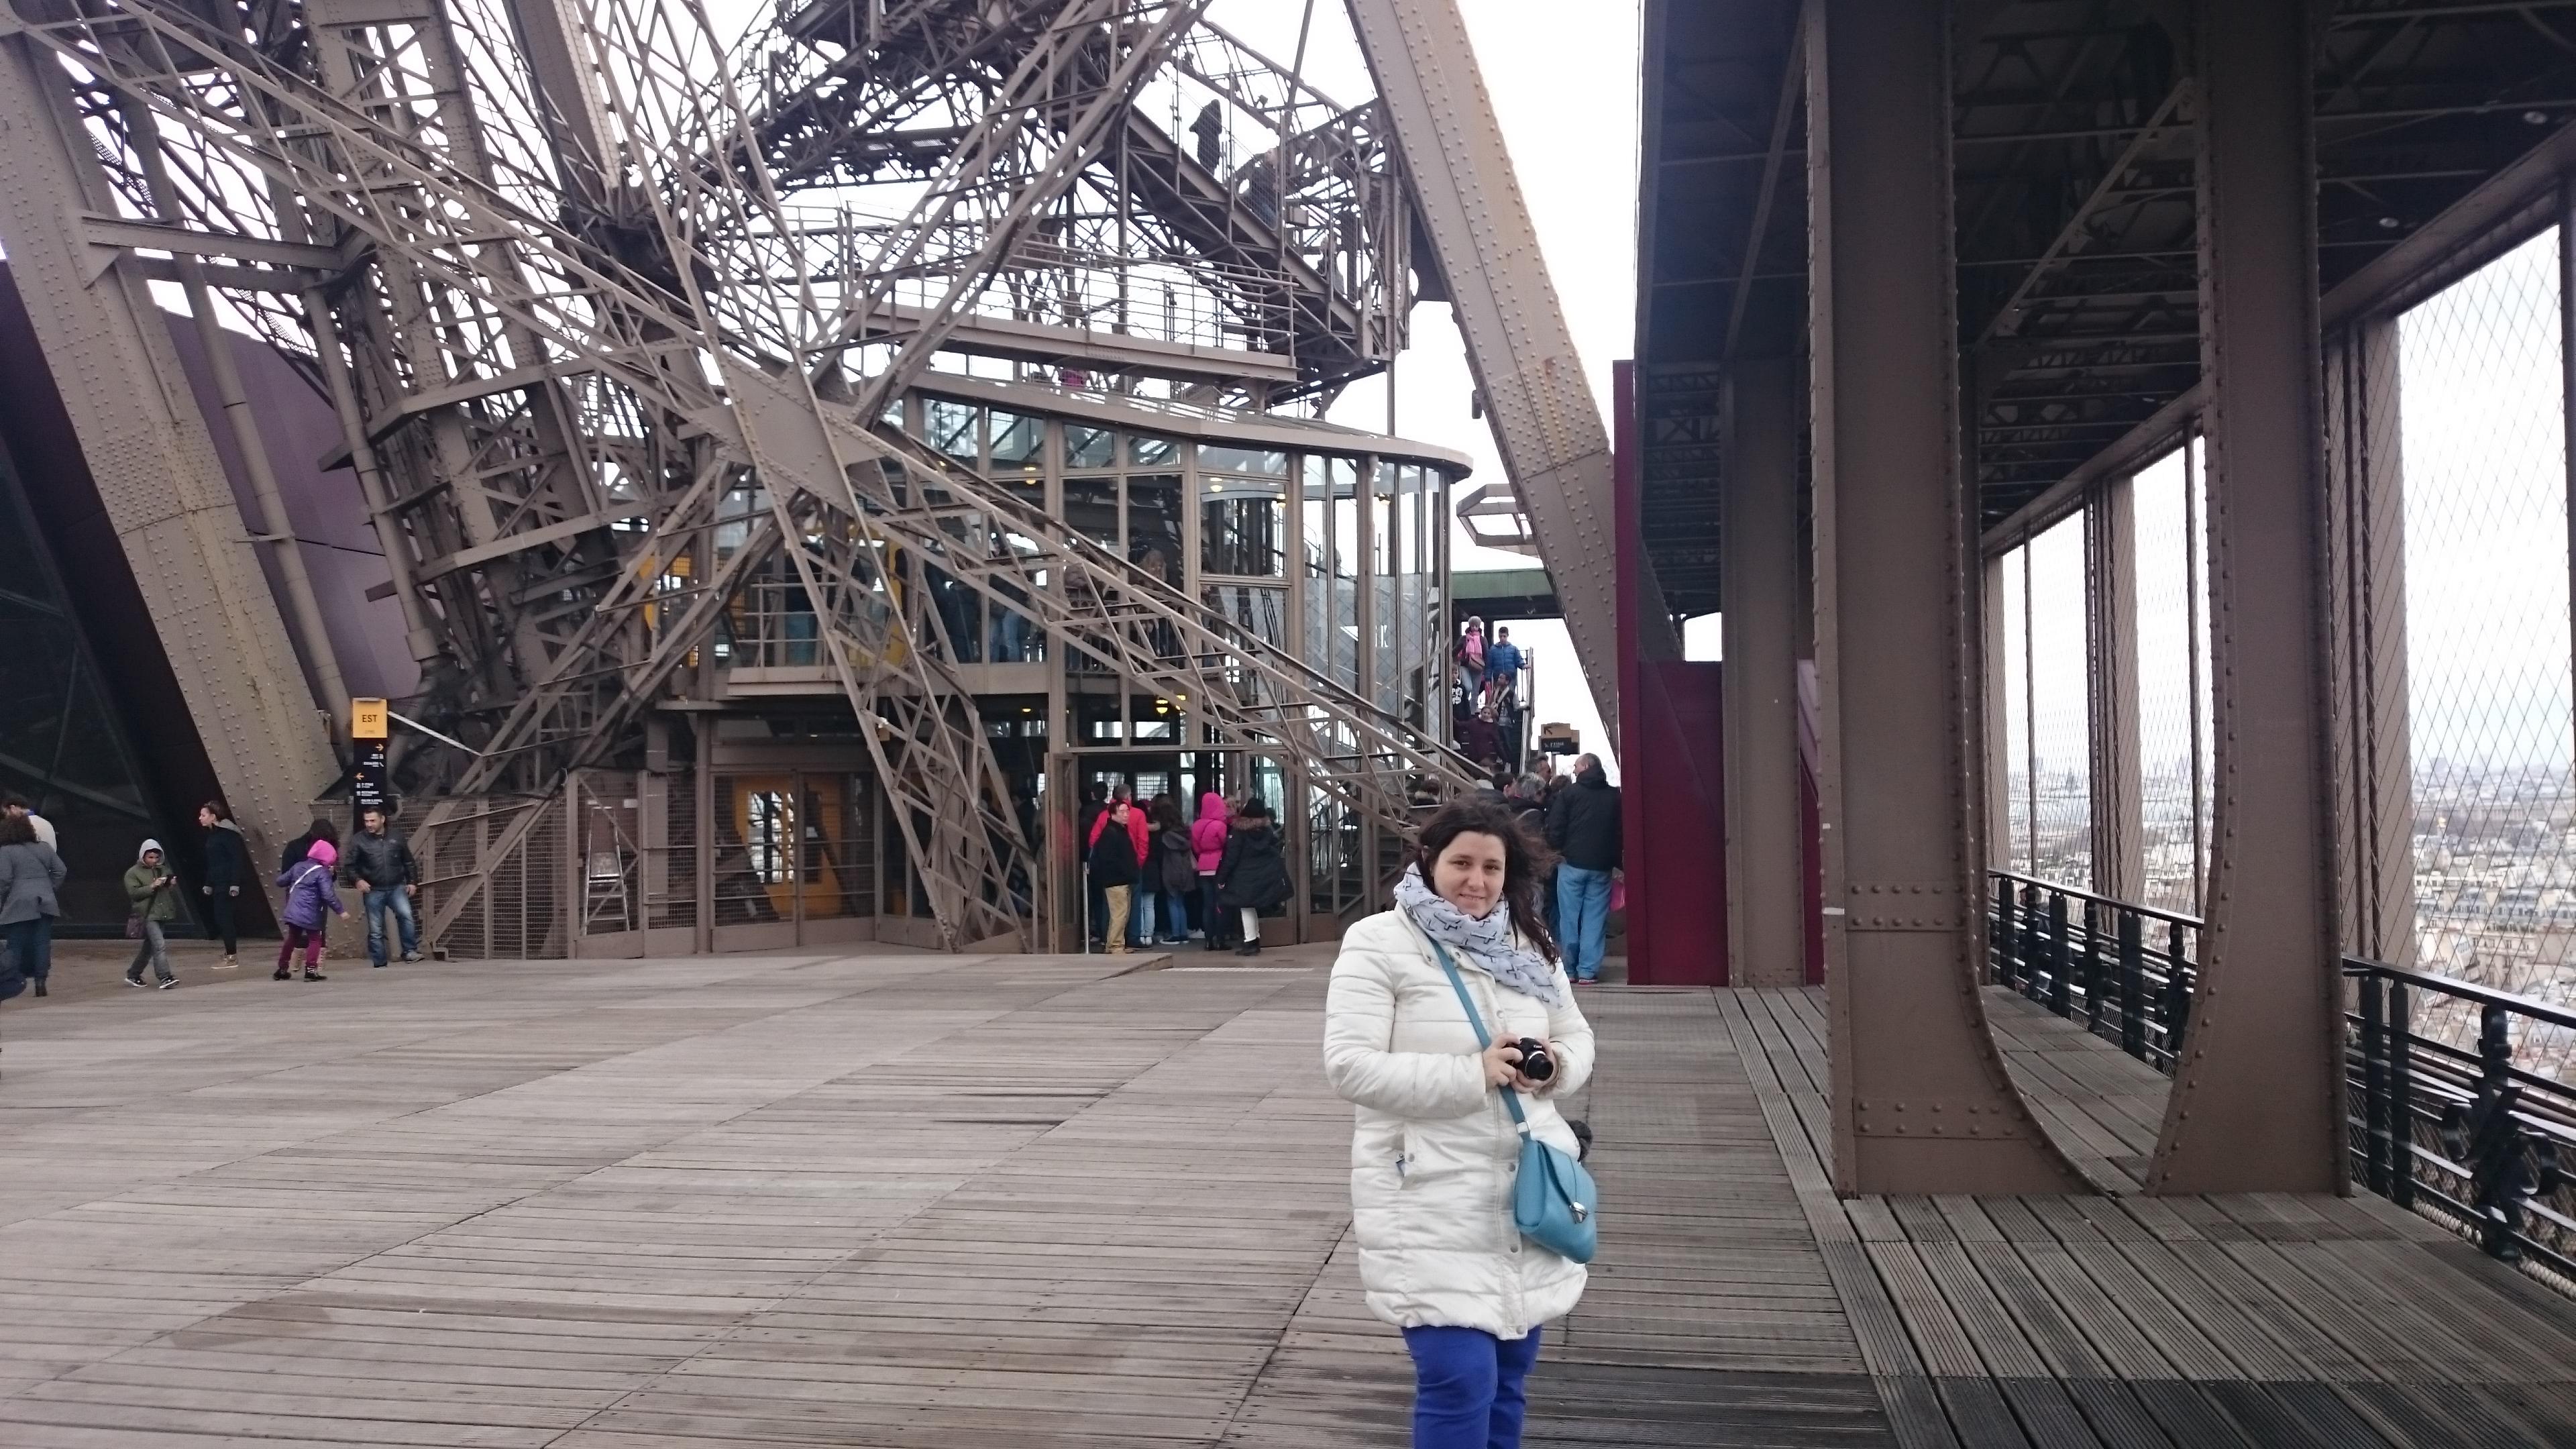 DSC 1965 - Visitando la Torre Eiffel en Paris